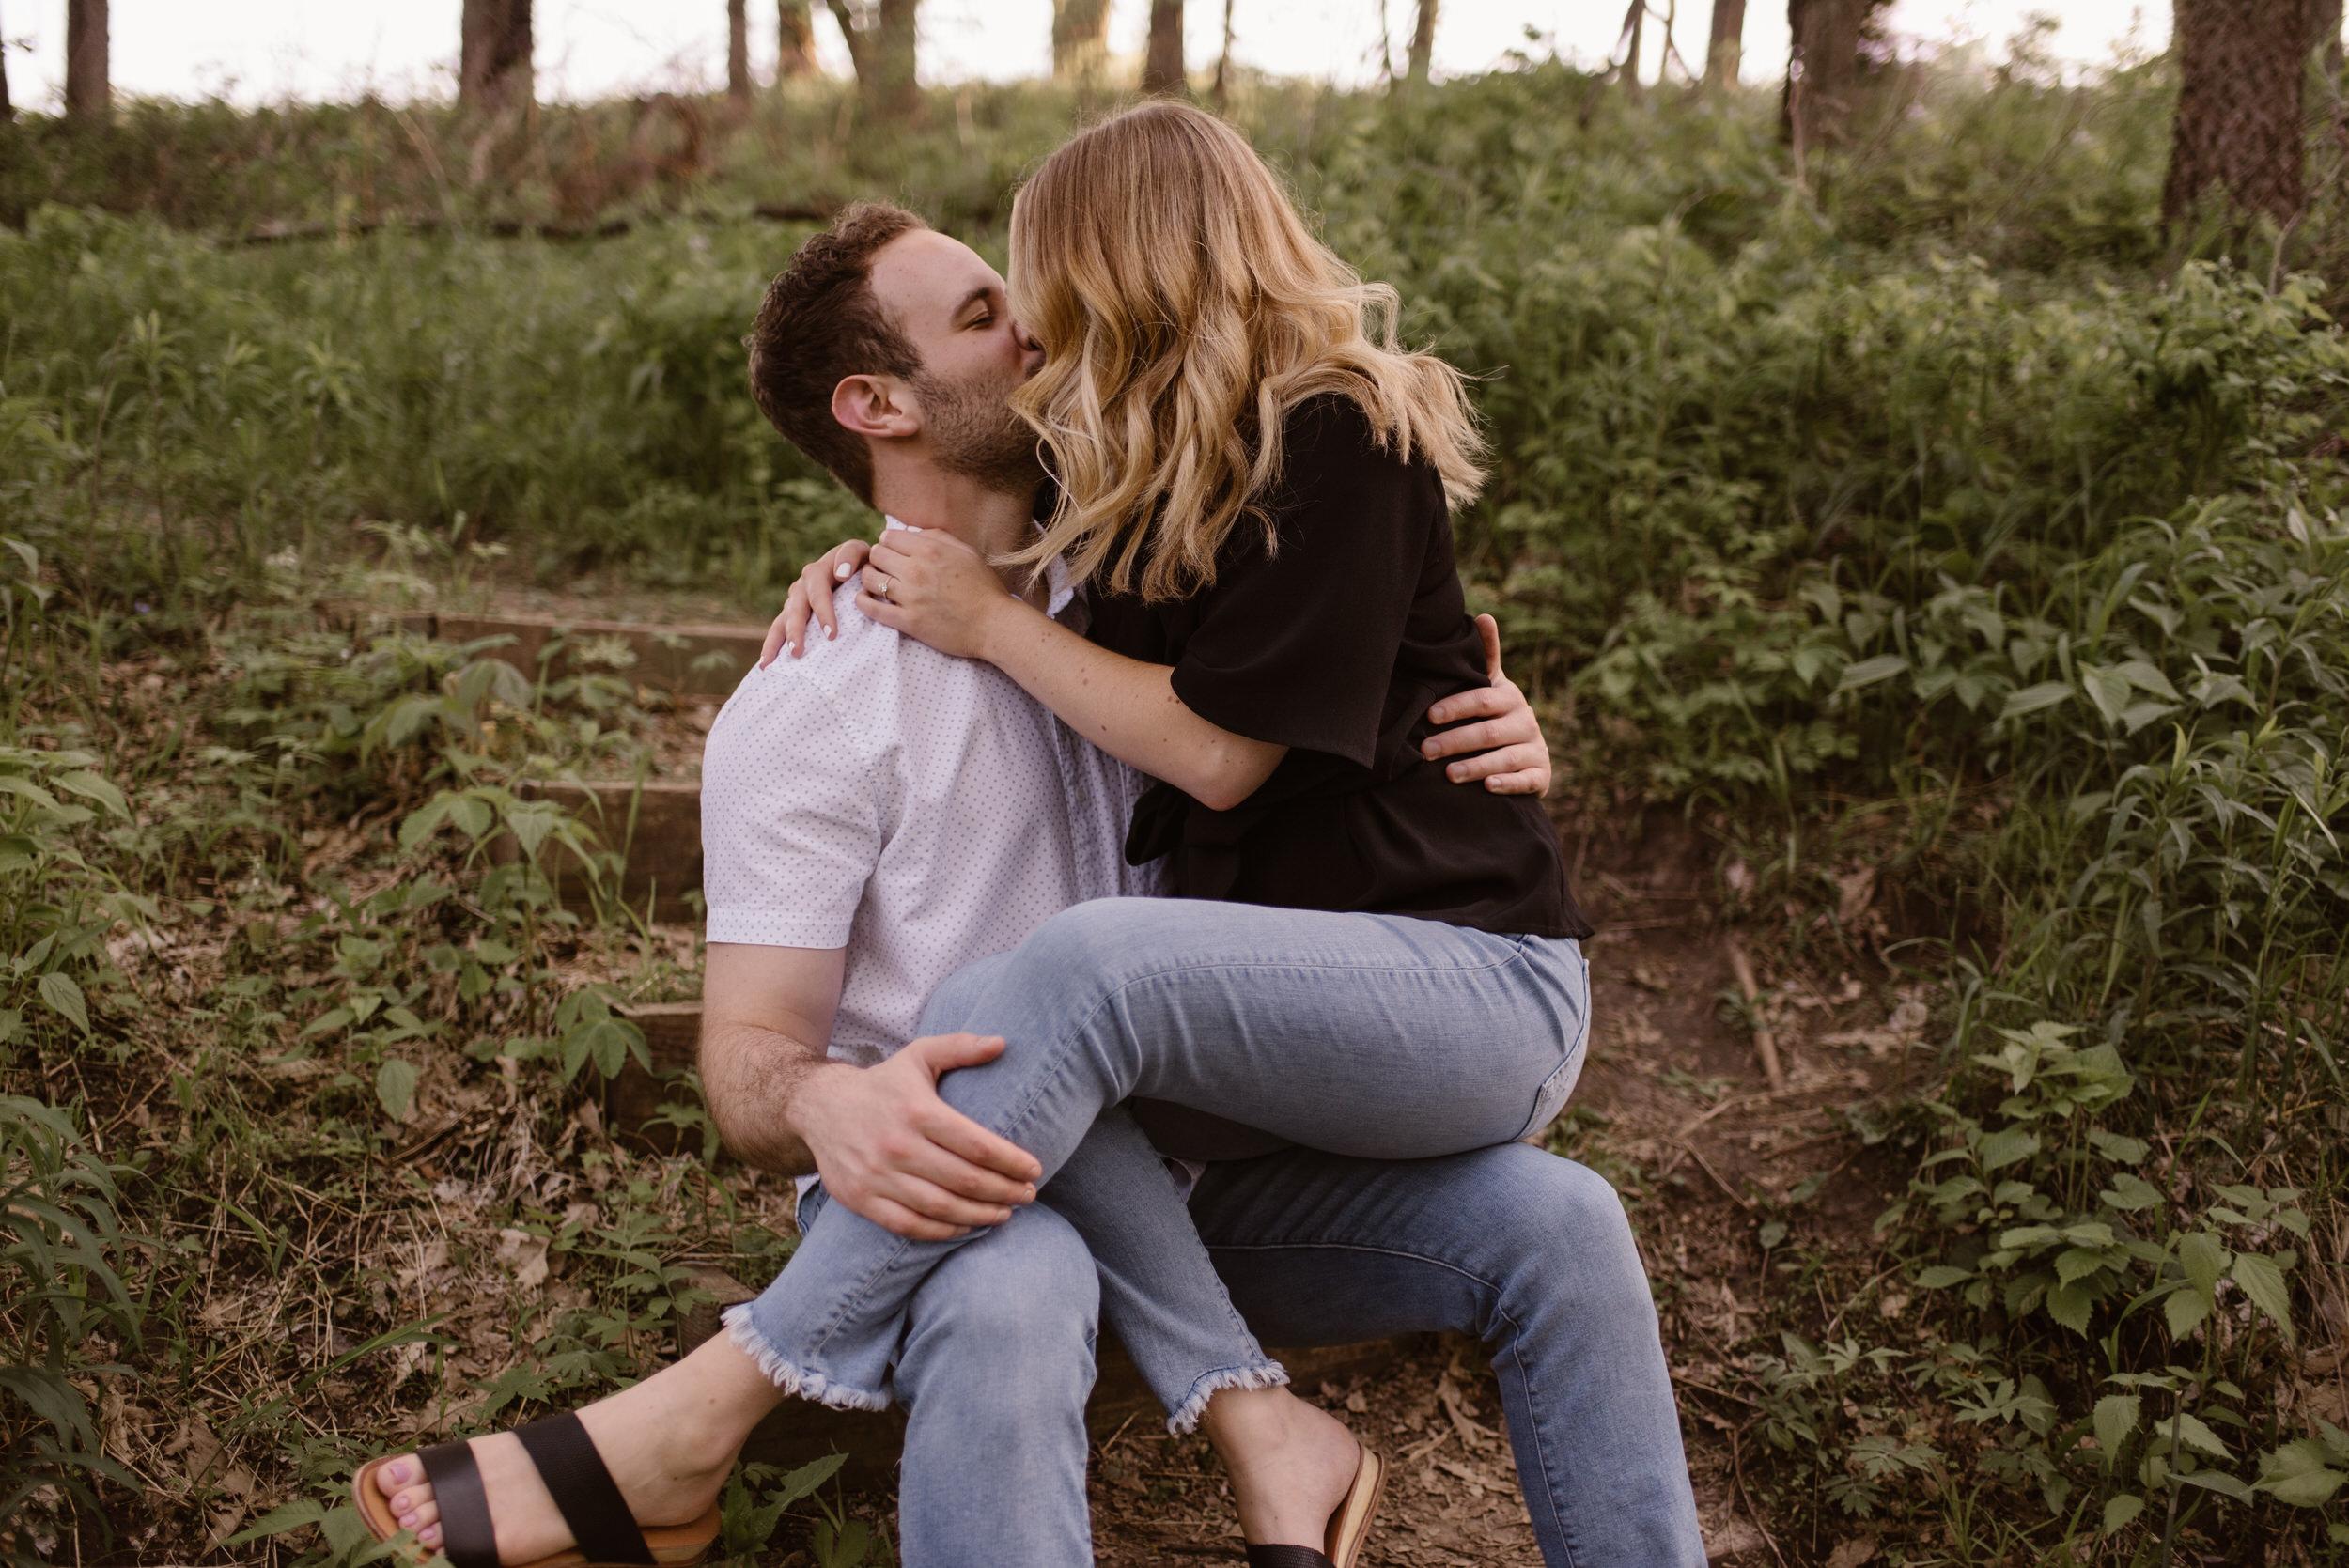 Omaha-Nebraska-Engagement-Session-Kaylie-Sirek-Photography-112.jpg